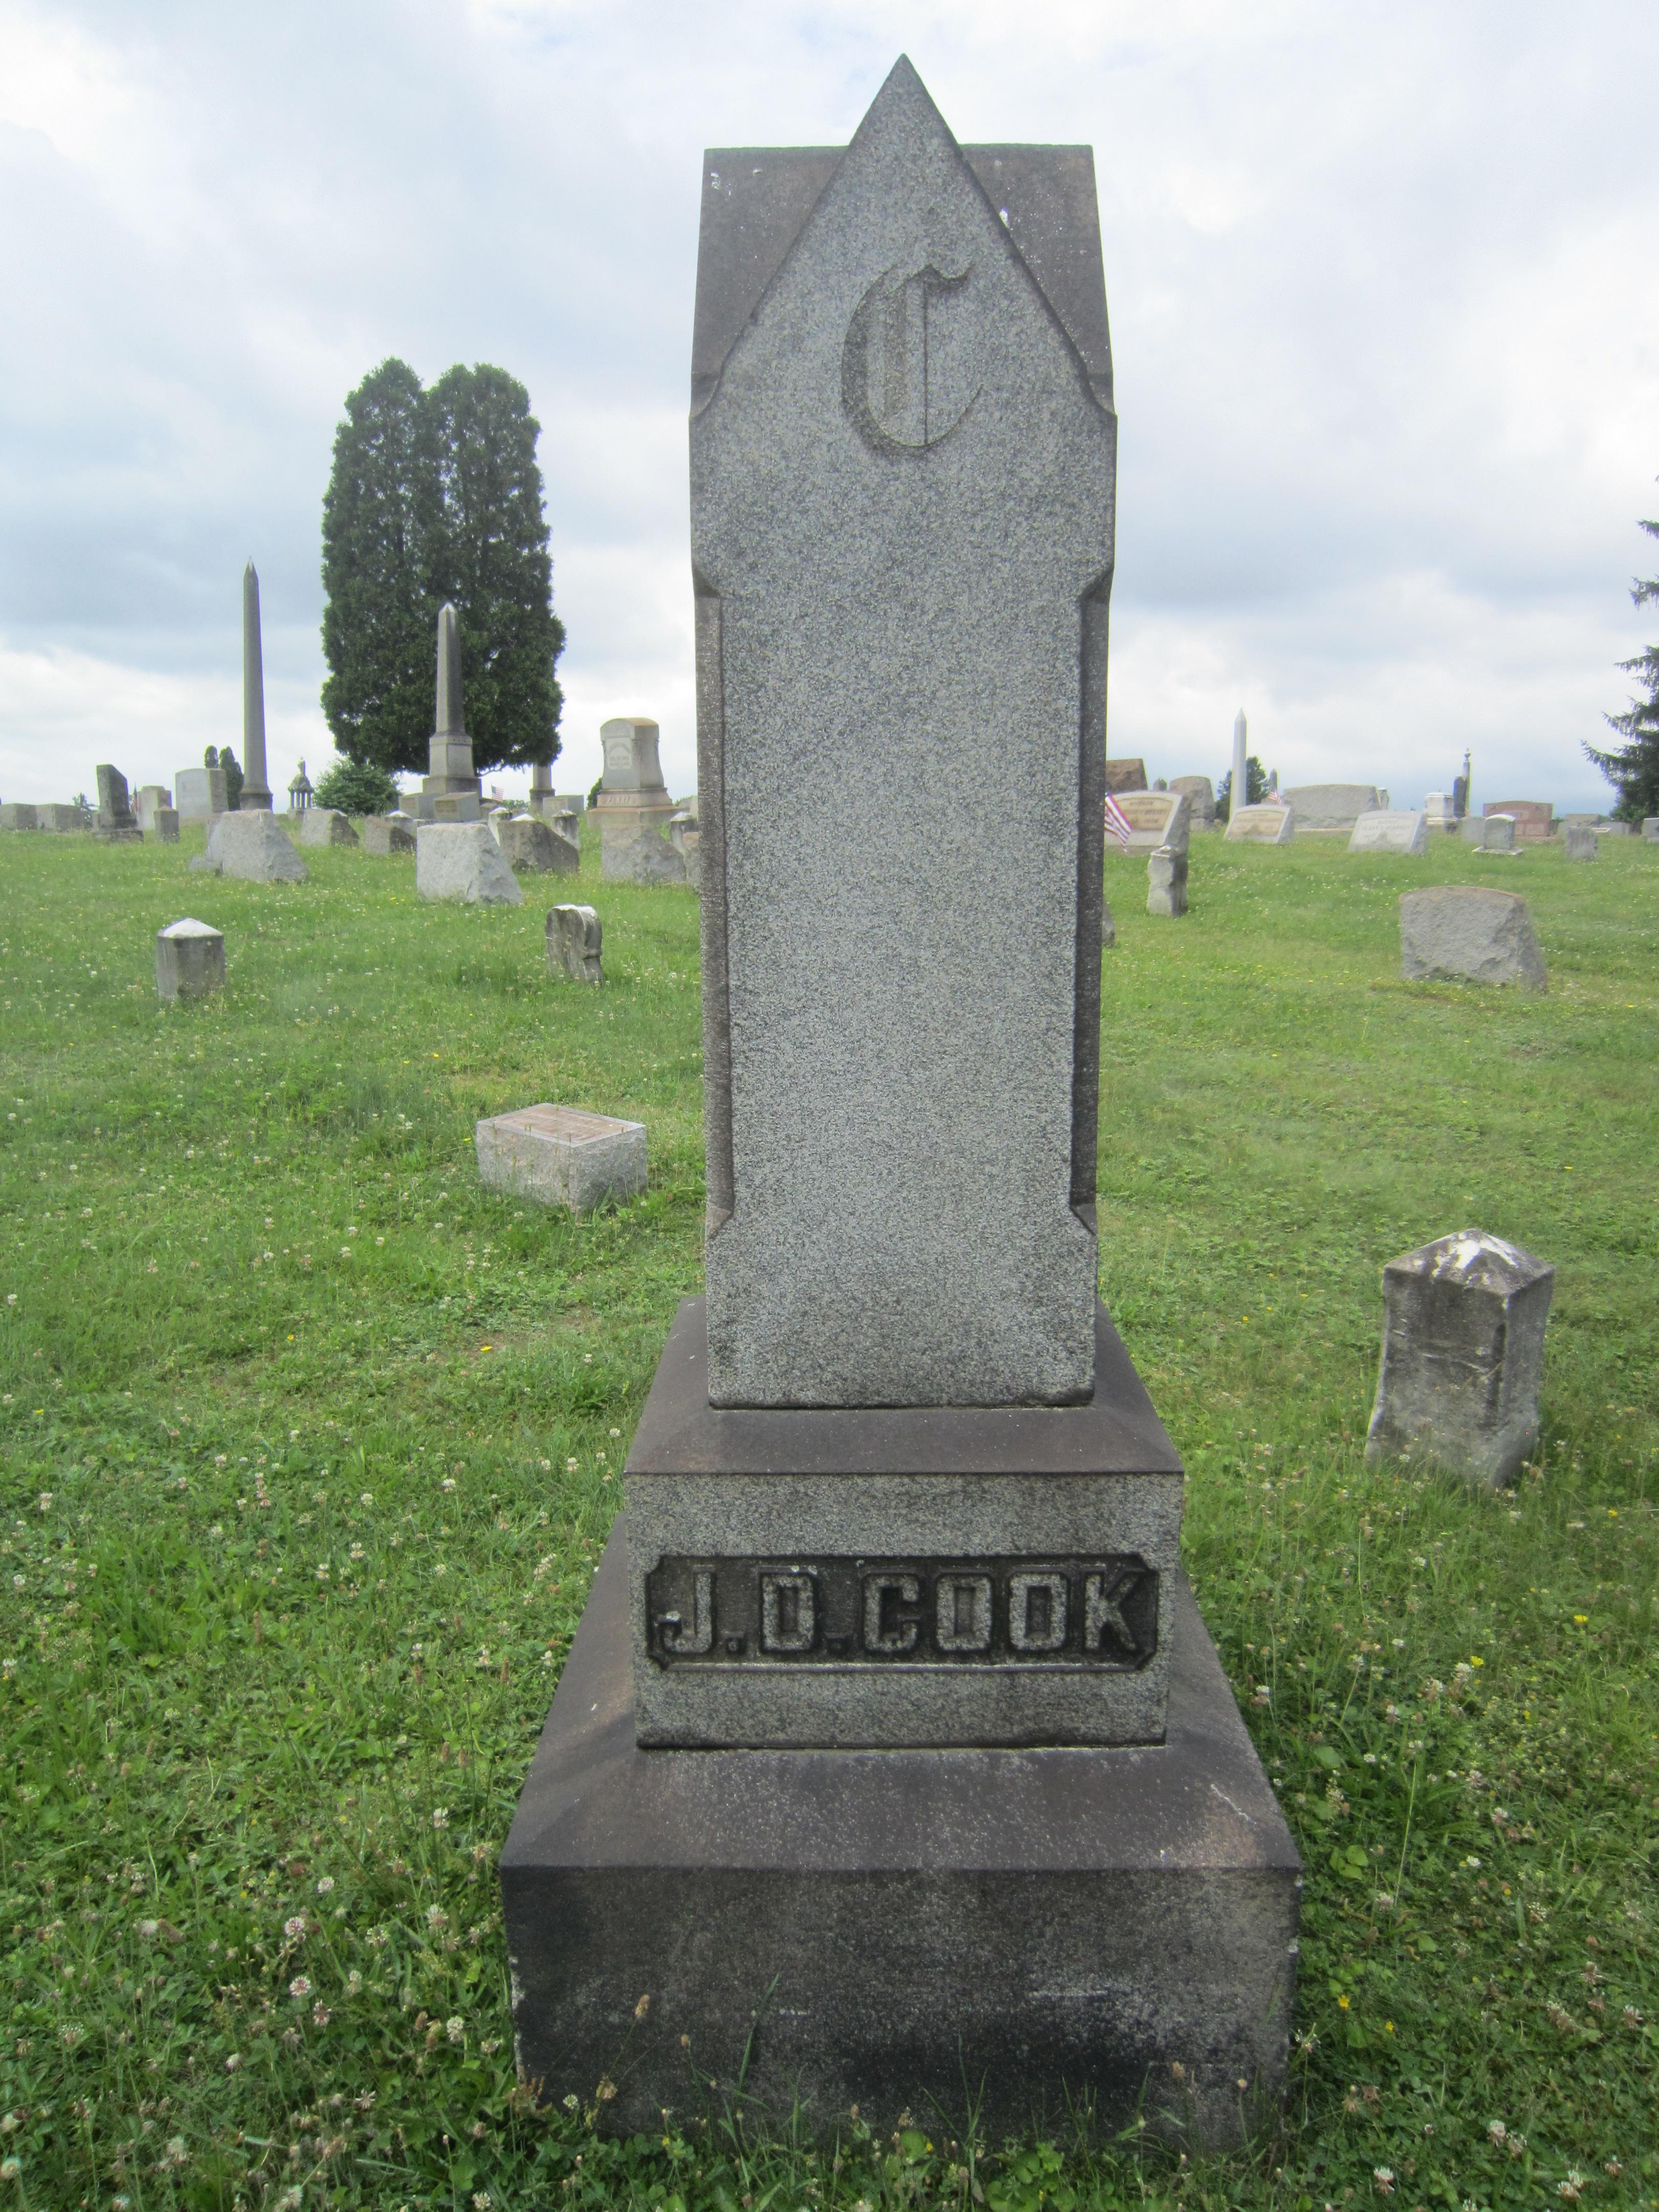 Charles Washington Cook